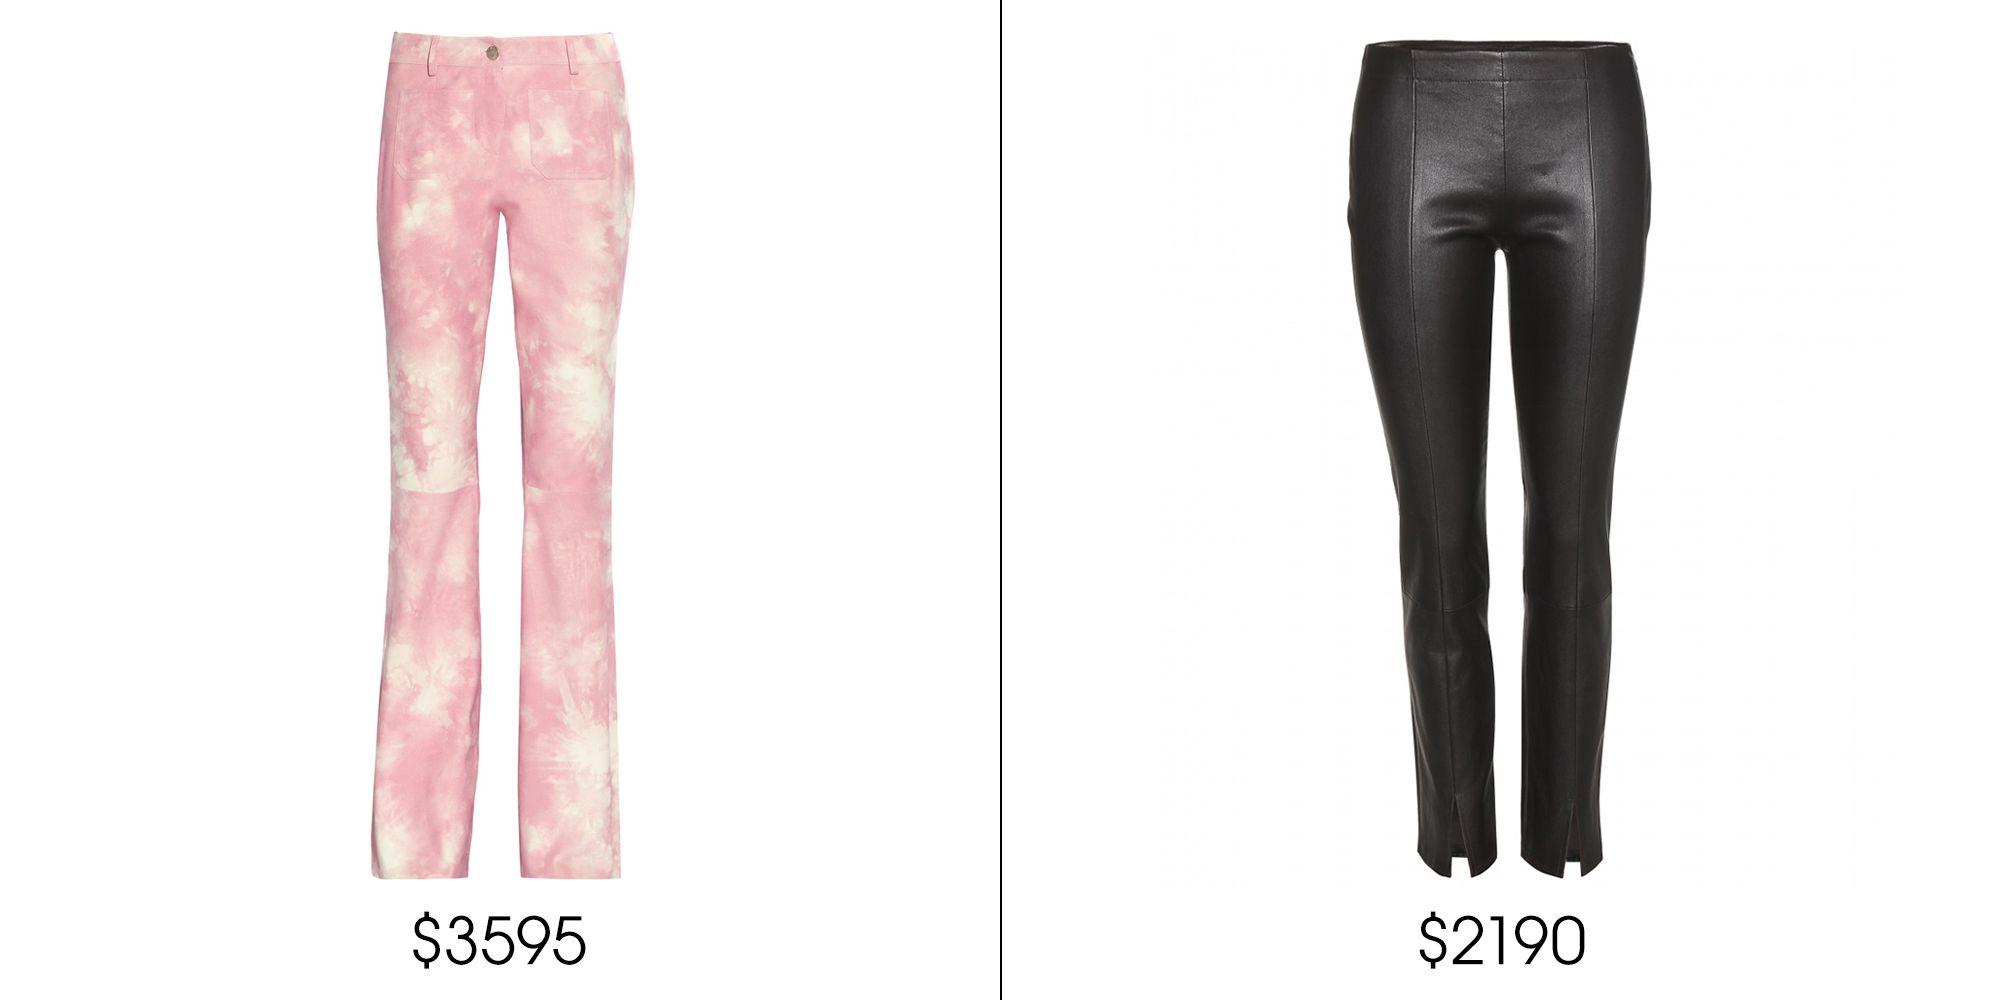 "Michael Kors Printed Suede Wide-leg Pants, $3,595; <a href=""http://www.net-a-porter.com/us/en/product/514466"" target=""_blank"">net-a-porter.com</a>    The Row Delors Leather Trousers, $2,190; <a href=""http://www.mytheresa.com/en-us/delors-leather-trousers.html"" target=""_blank"">mytheresa.com</a>"